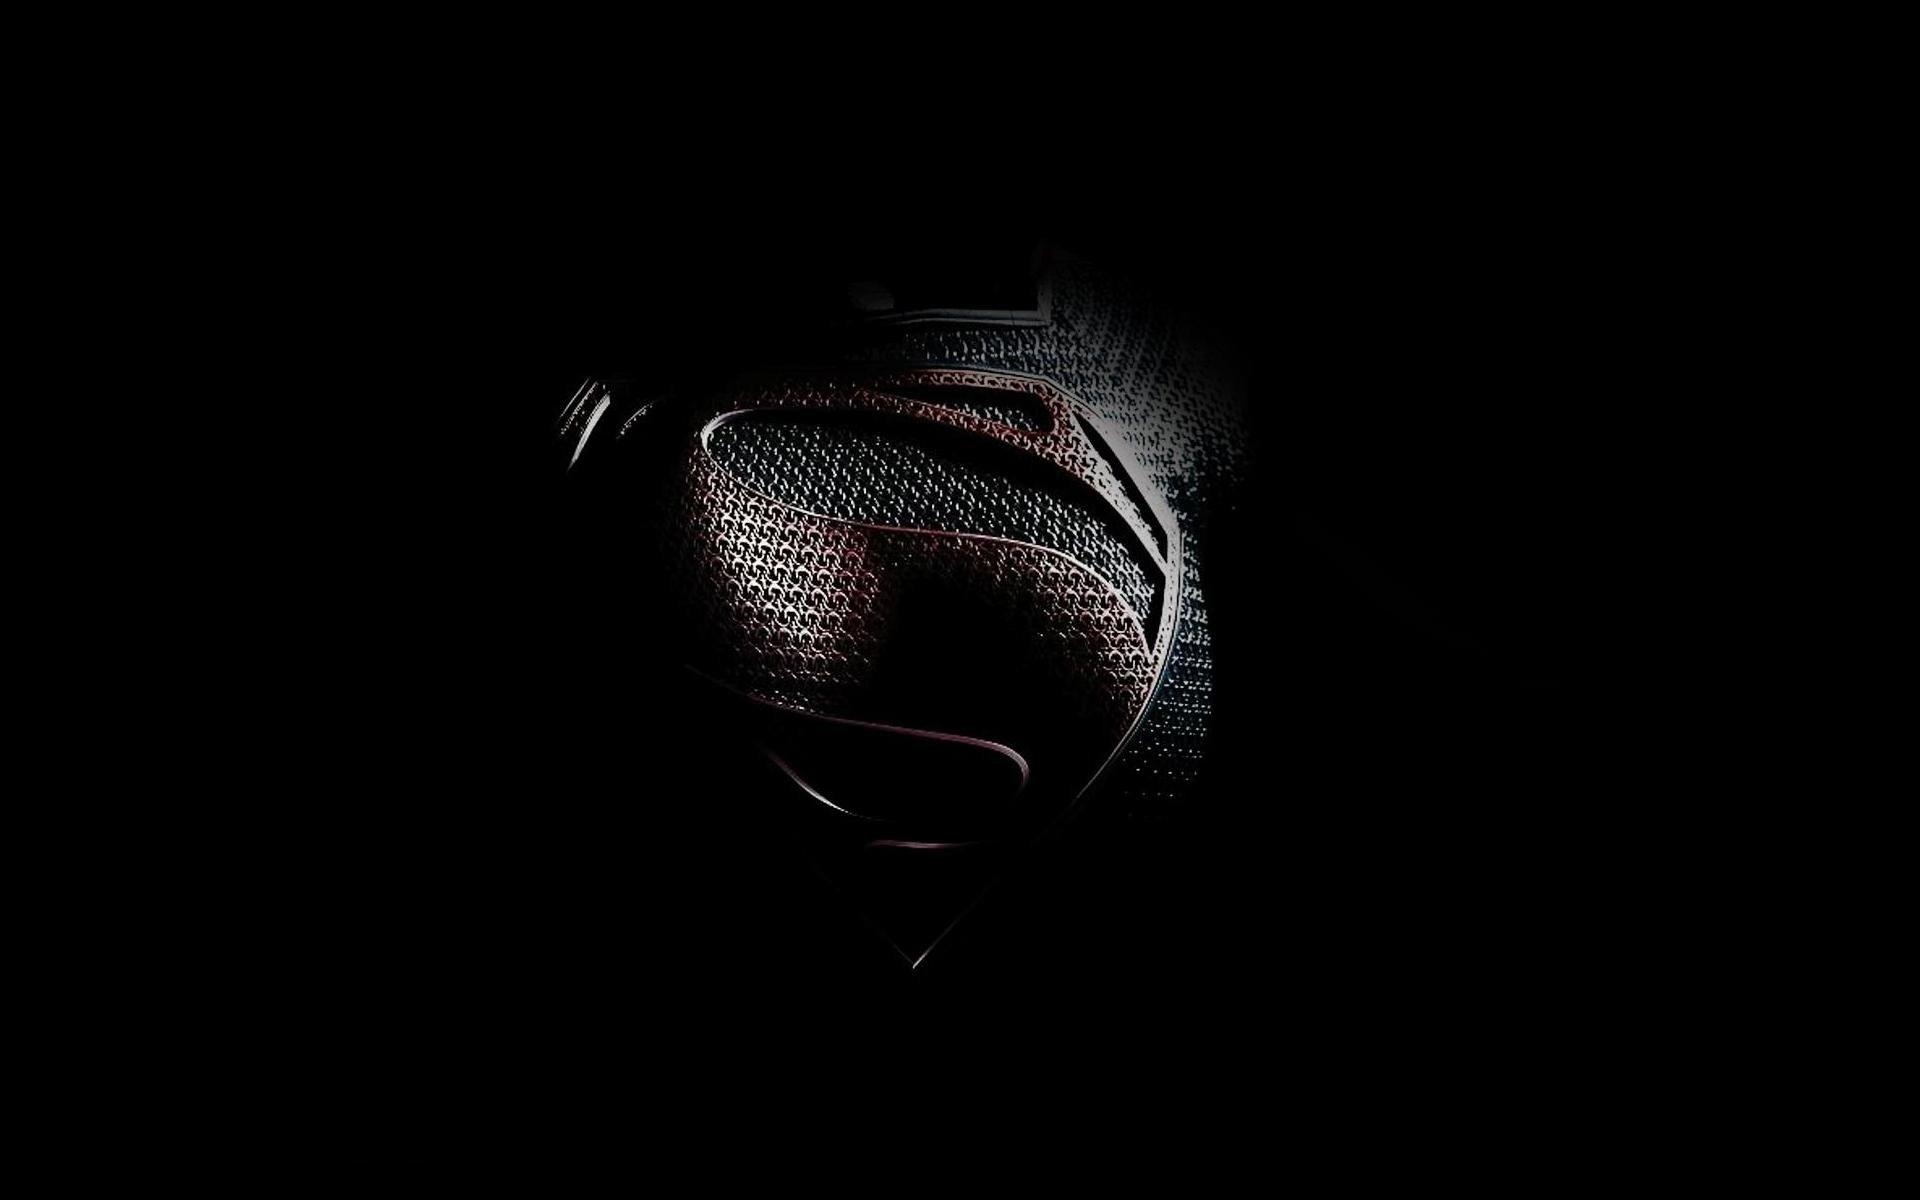 minimalistic movies Superman Man of Steel movie wallpaper background 1920x1200